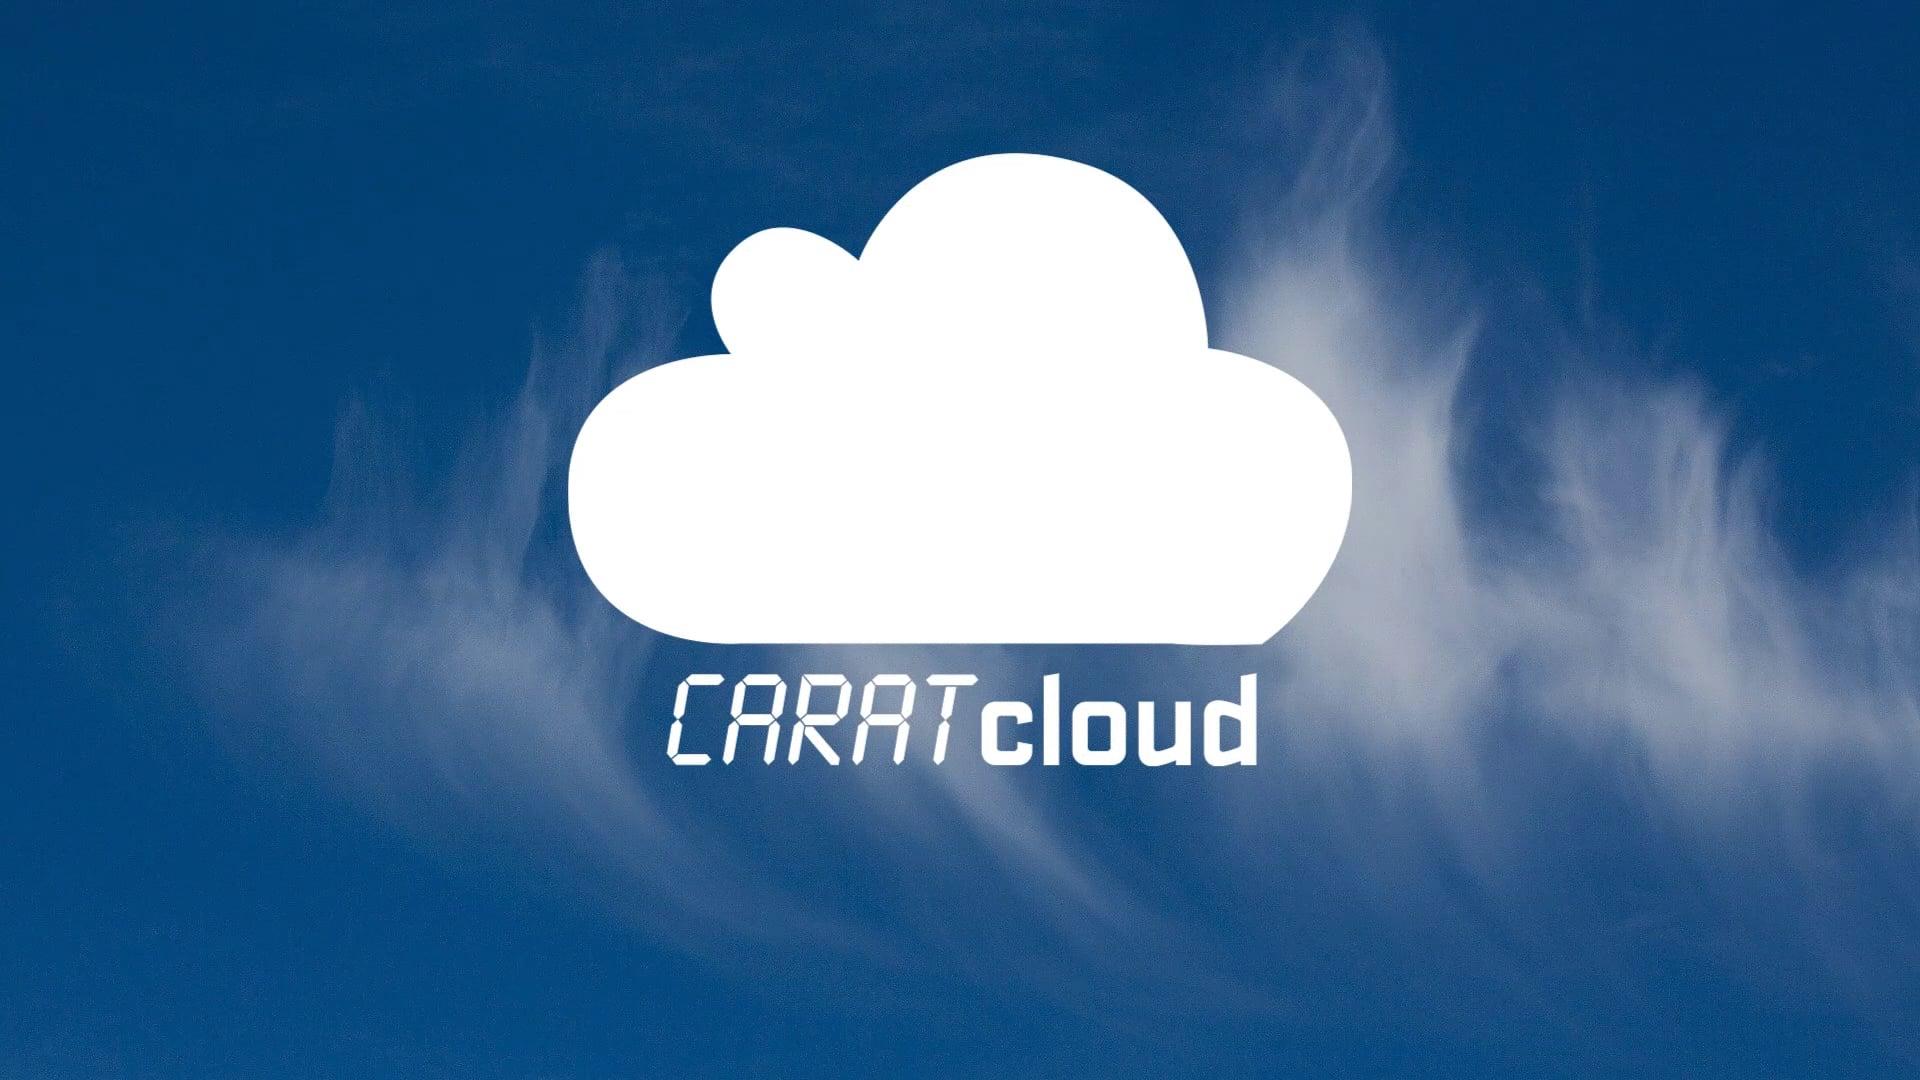 CARATcloud - Die Anmeldung